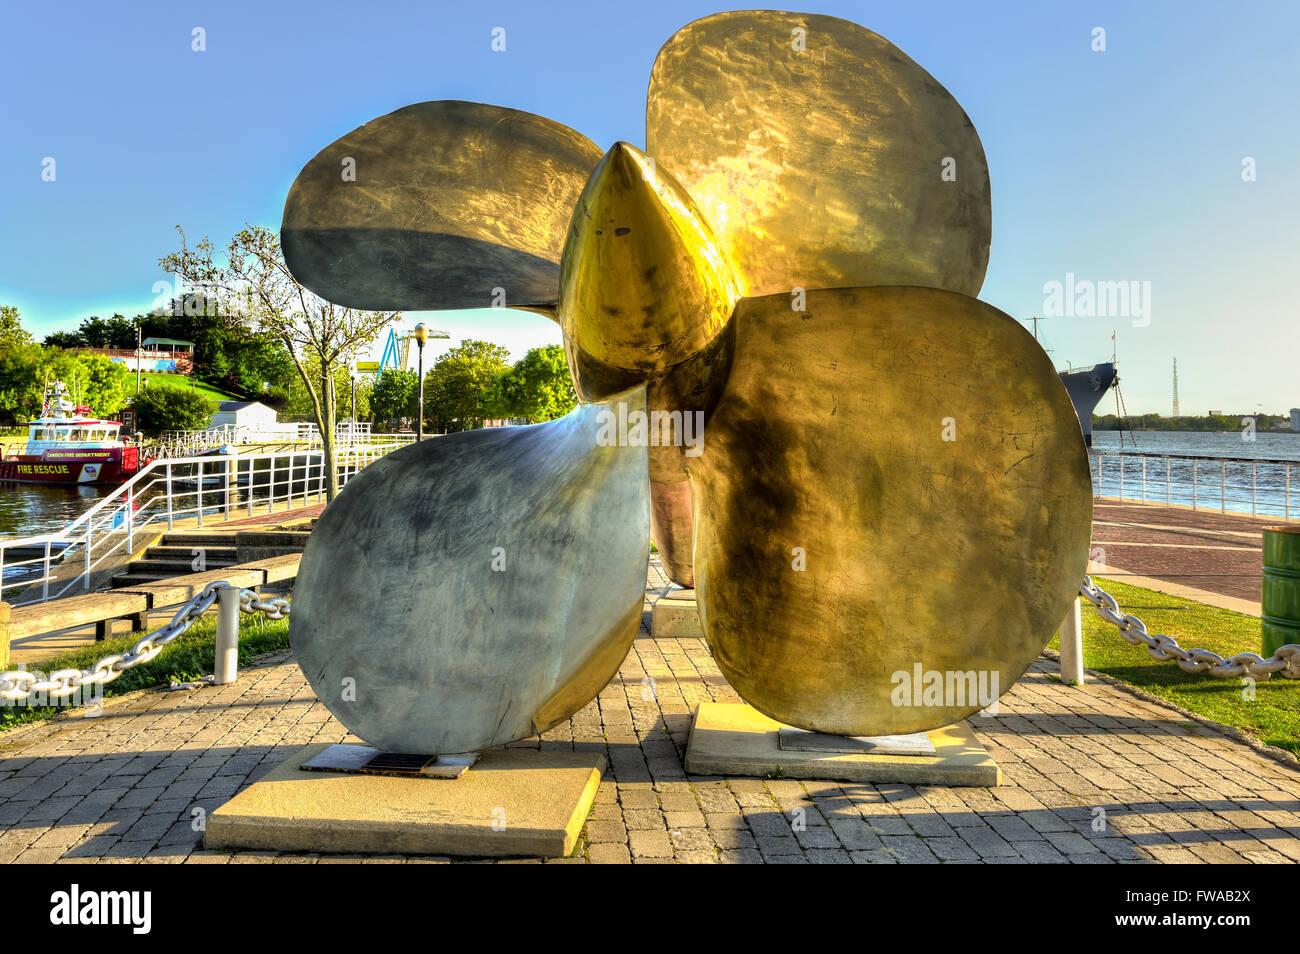 Gigantic golden propeller in a bright sunlight - Stock Image